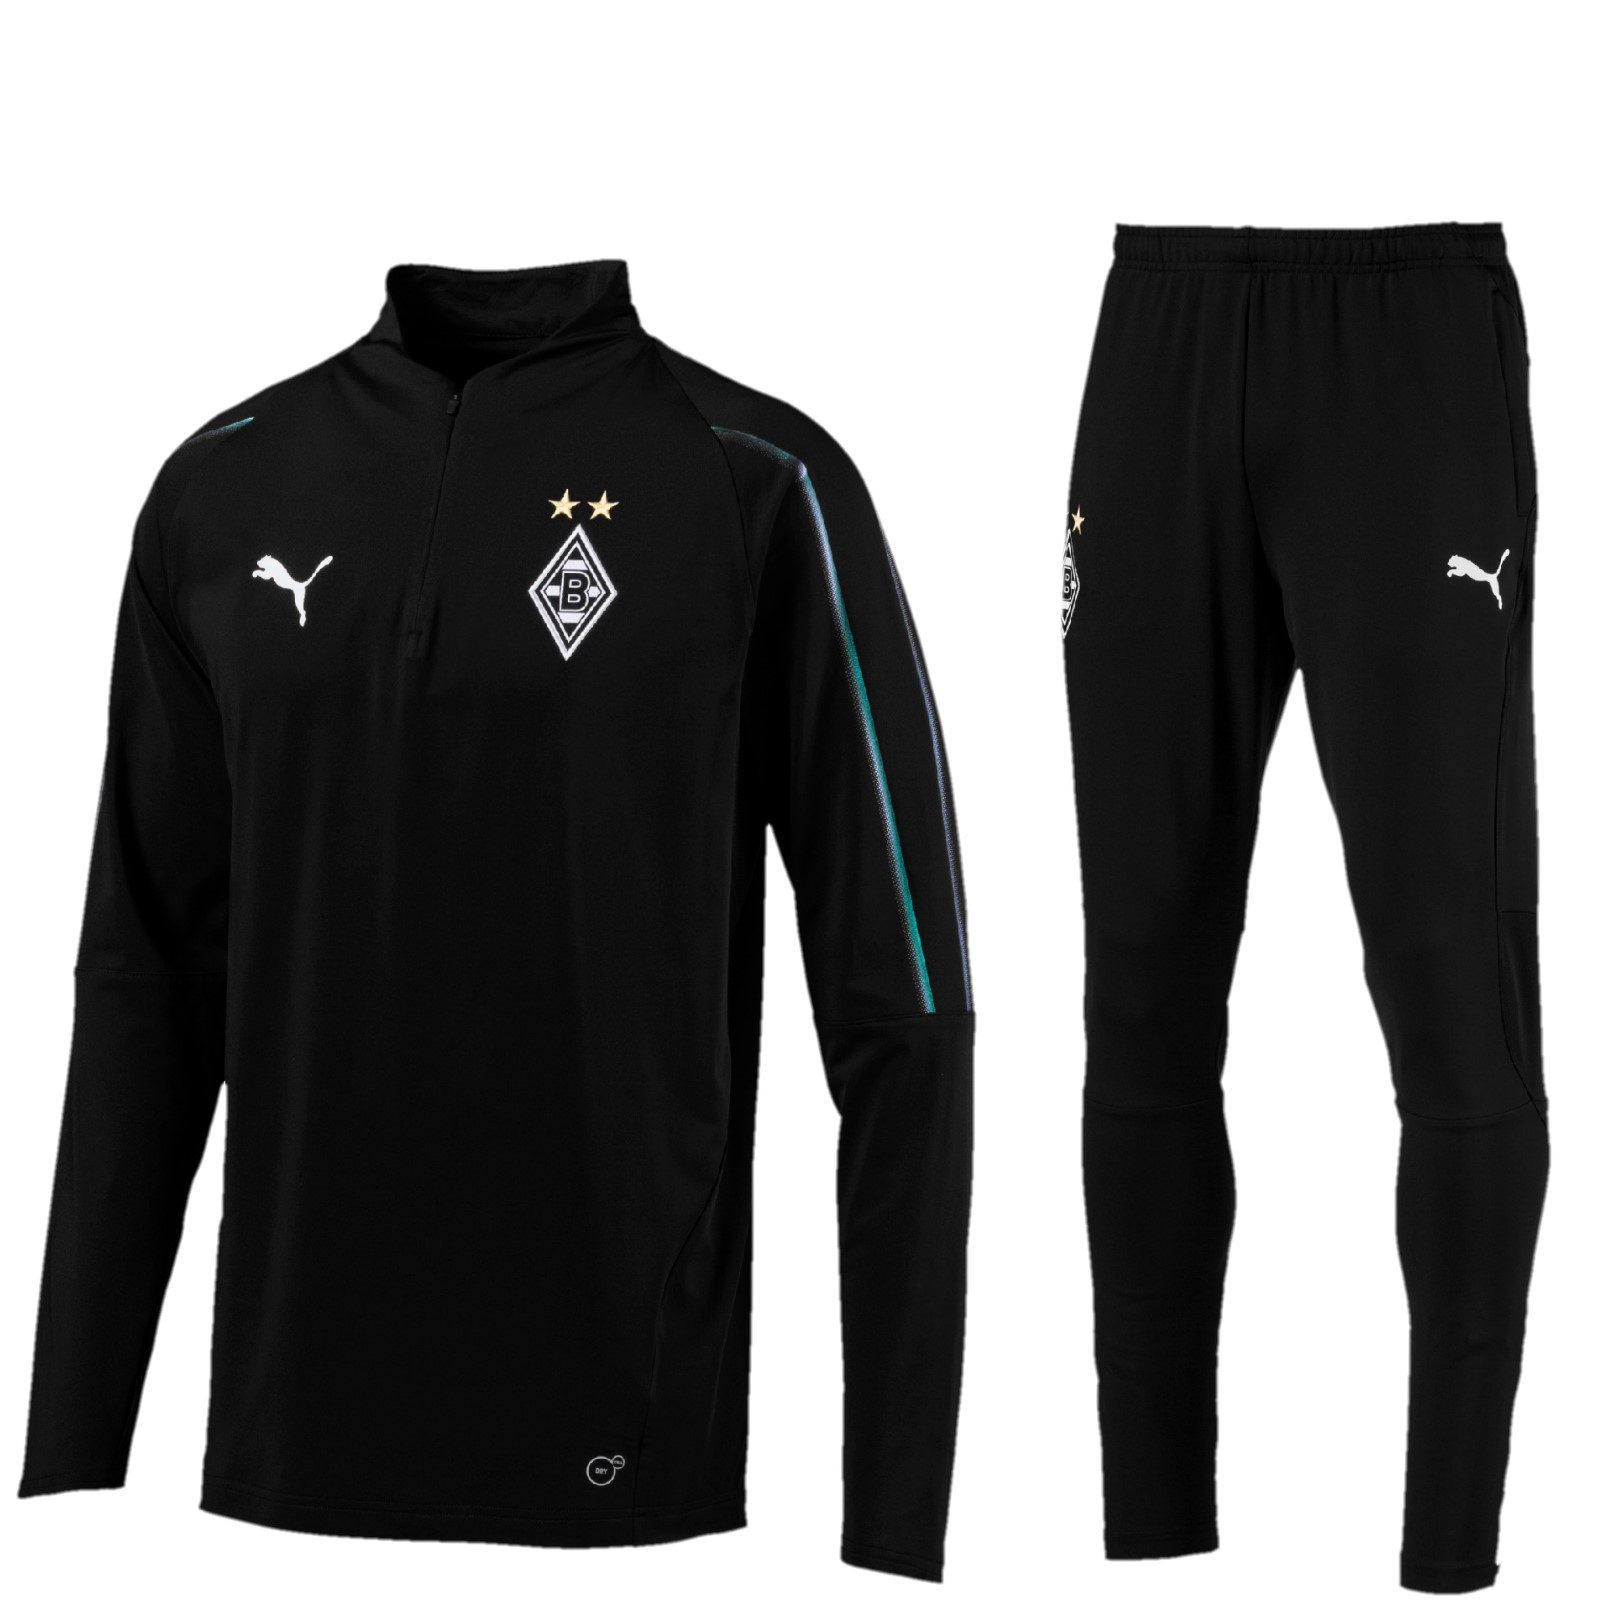 Puma BMG Borussia Mönchengladbach Trainingsanzug der Saison